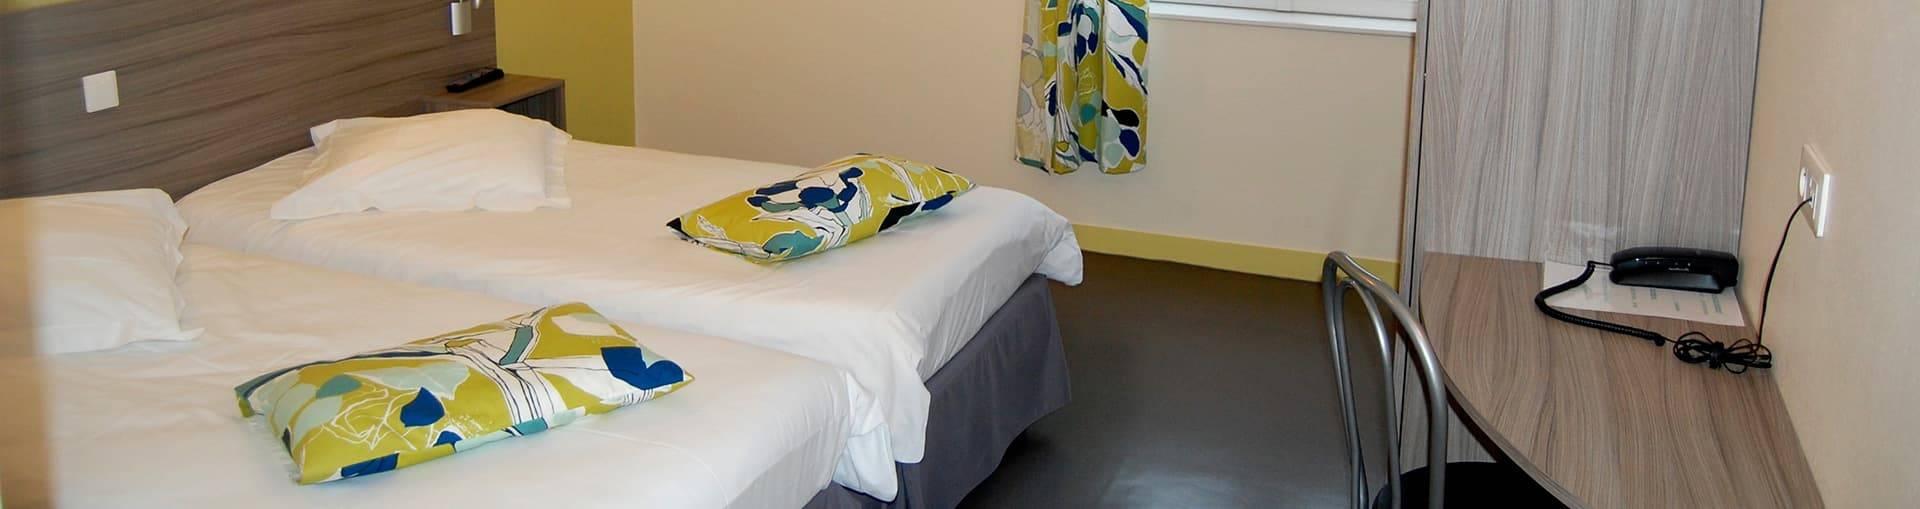 OTAA_Header_Hotel_1920x509.jpg